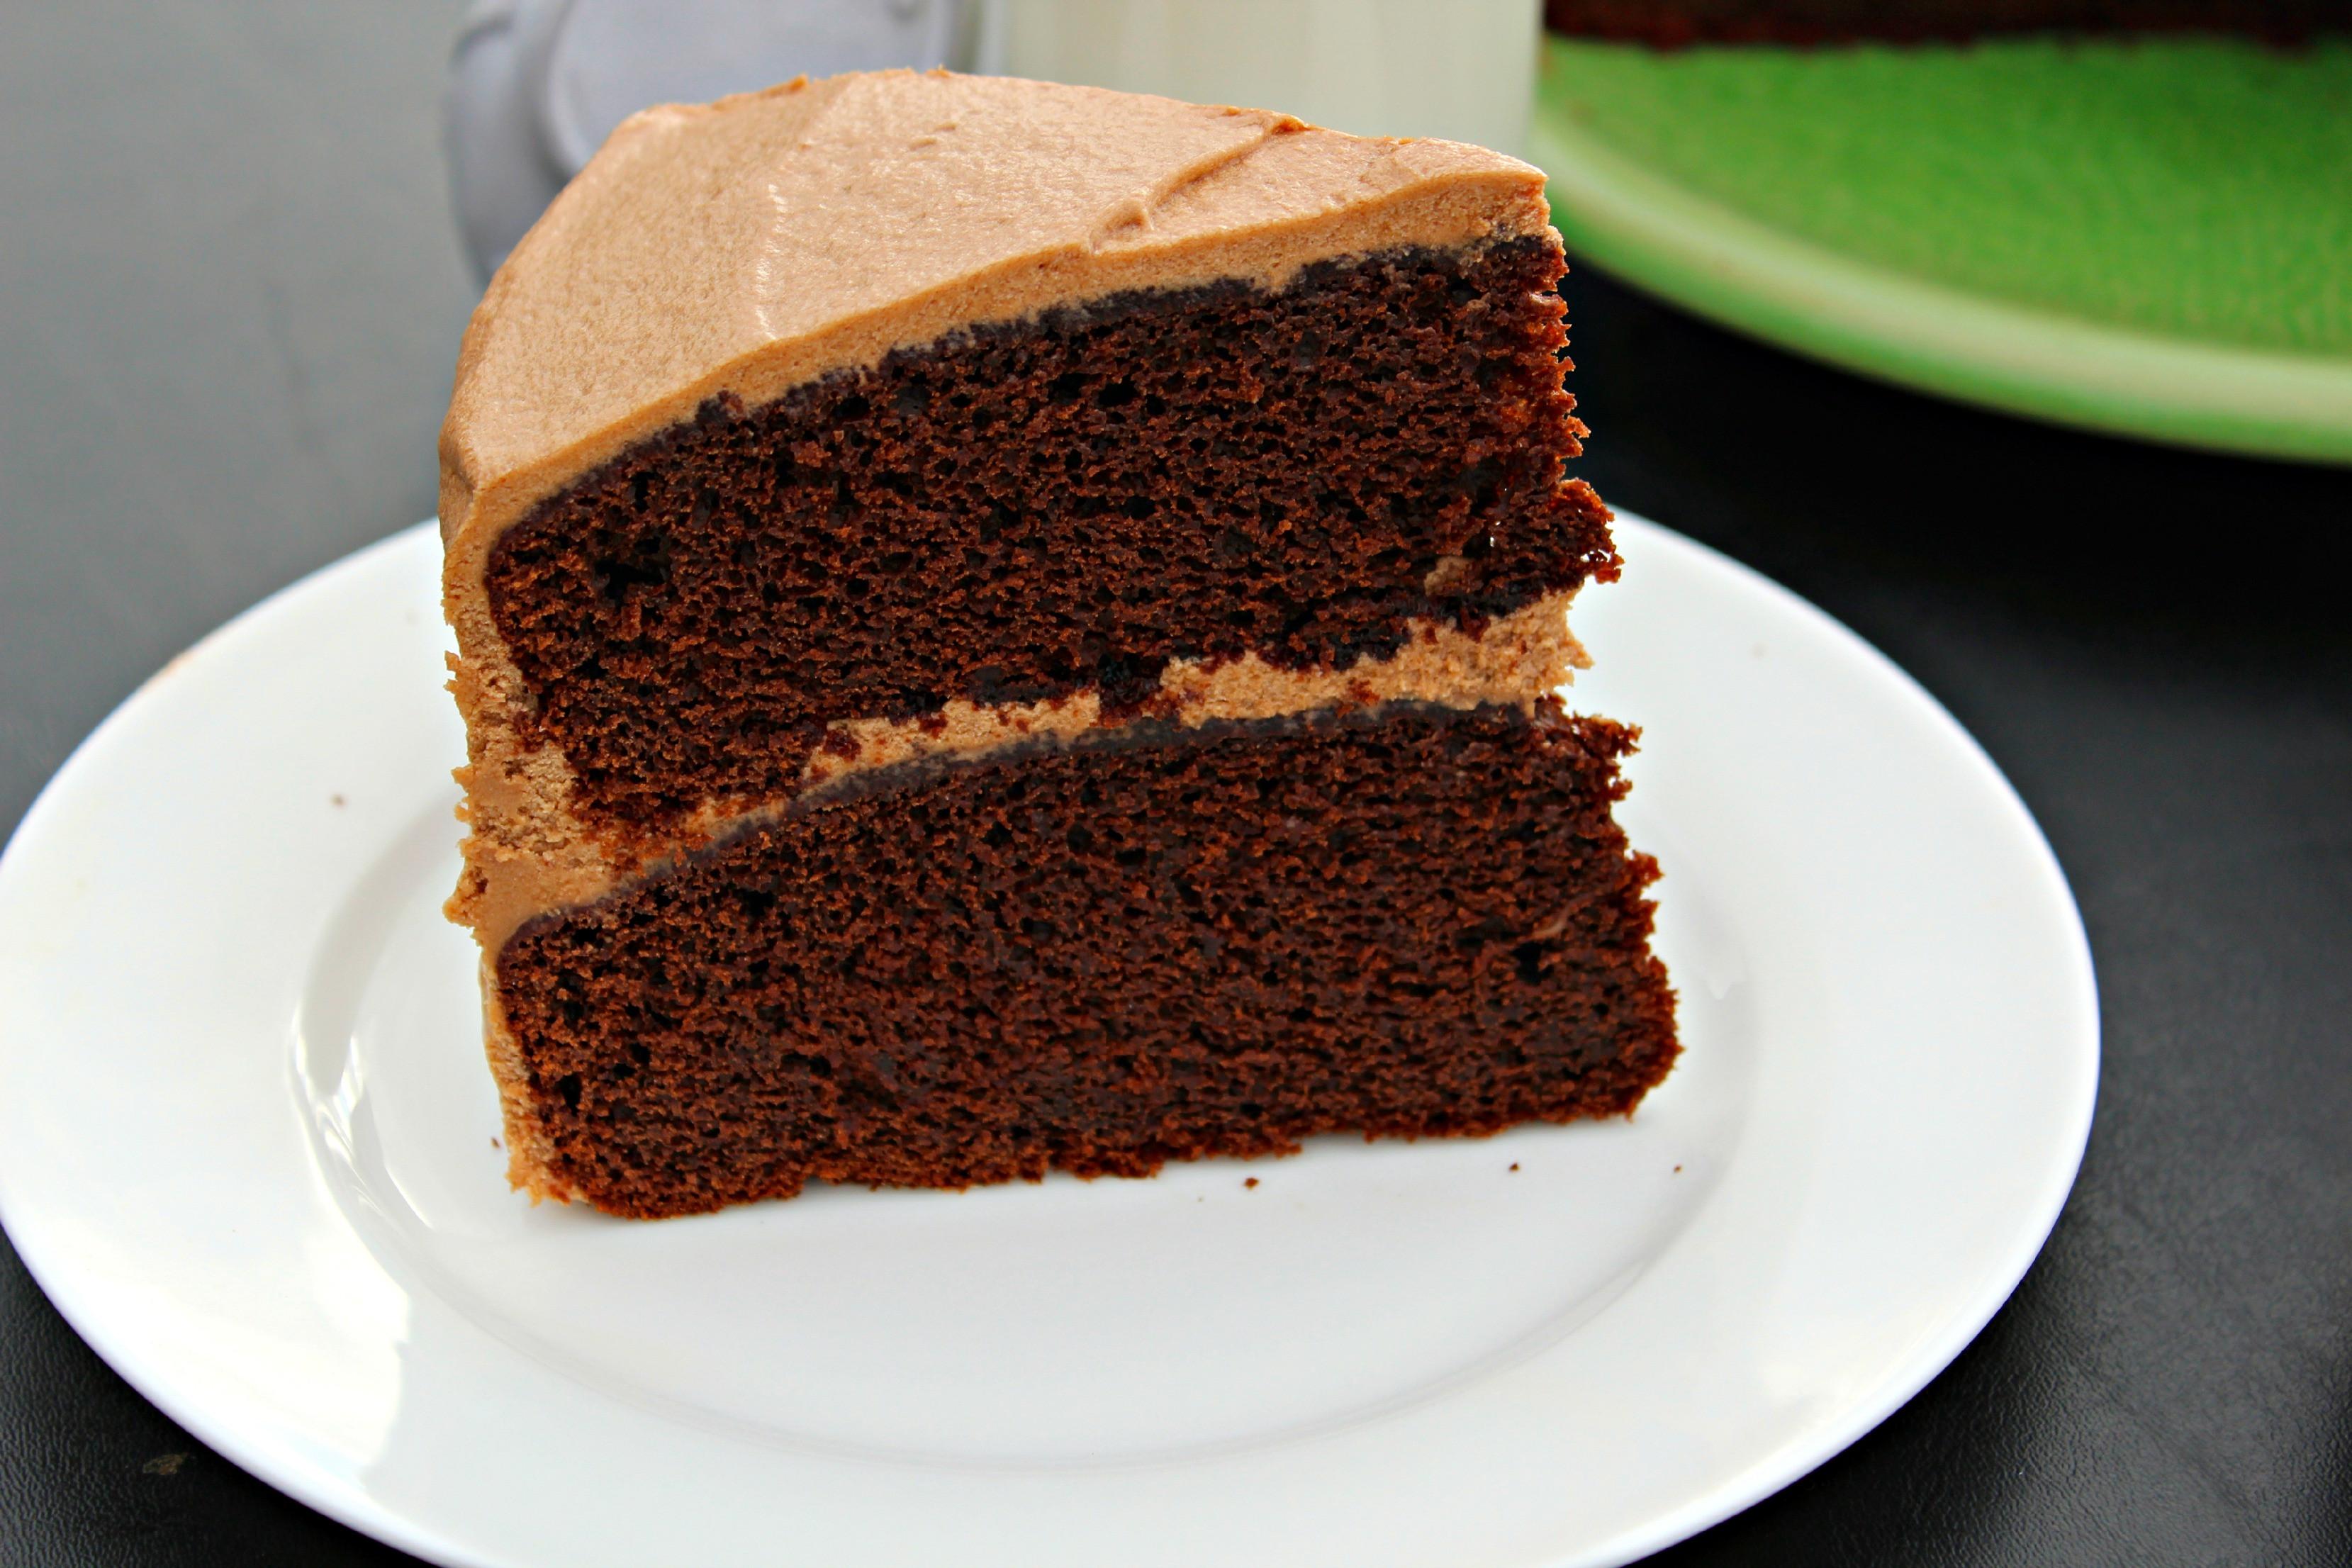 Chocolate Mocha Cake  Coffee Lover s Chocolate Mocha Cake The plete Savorist